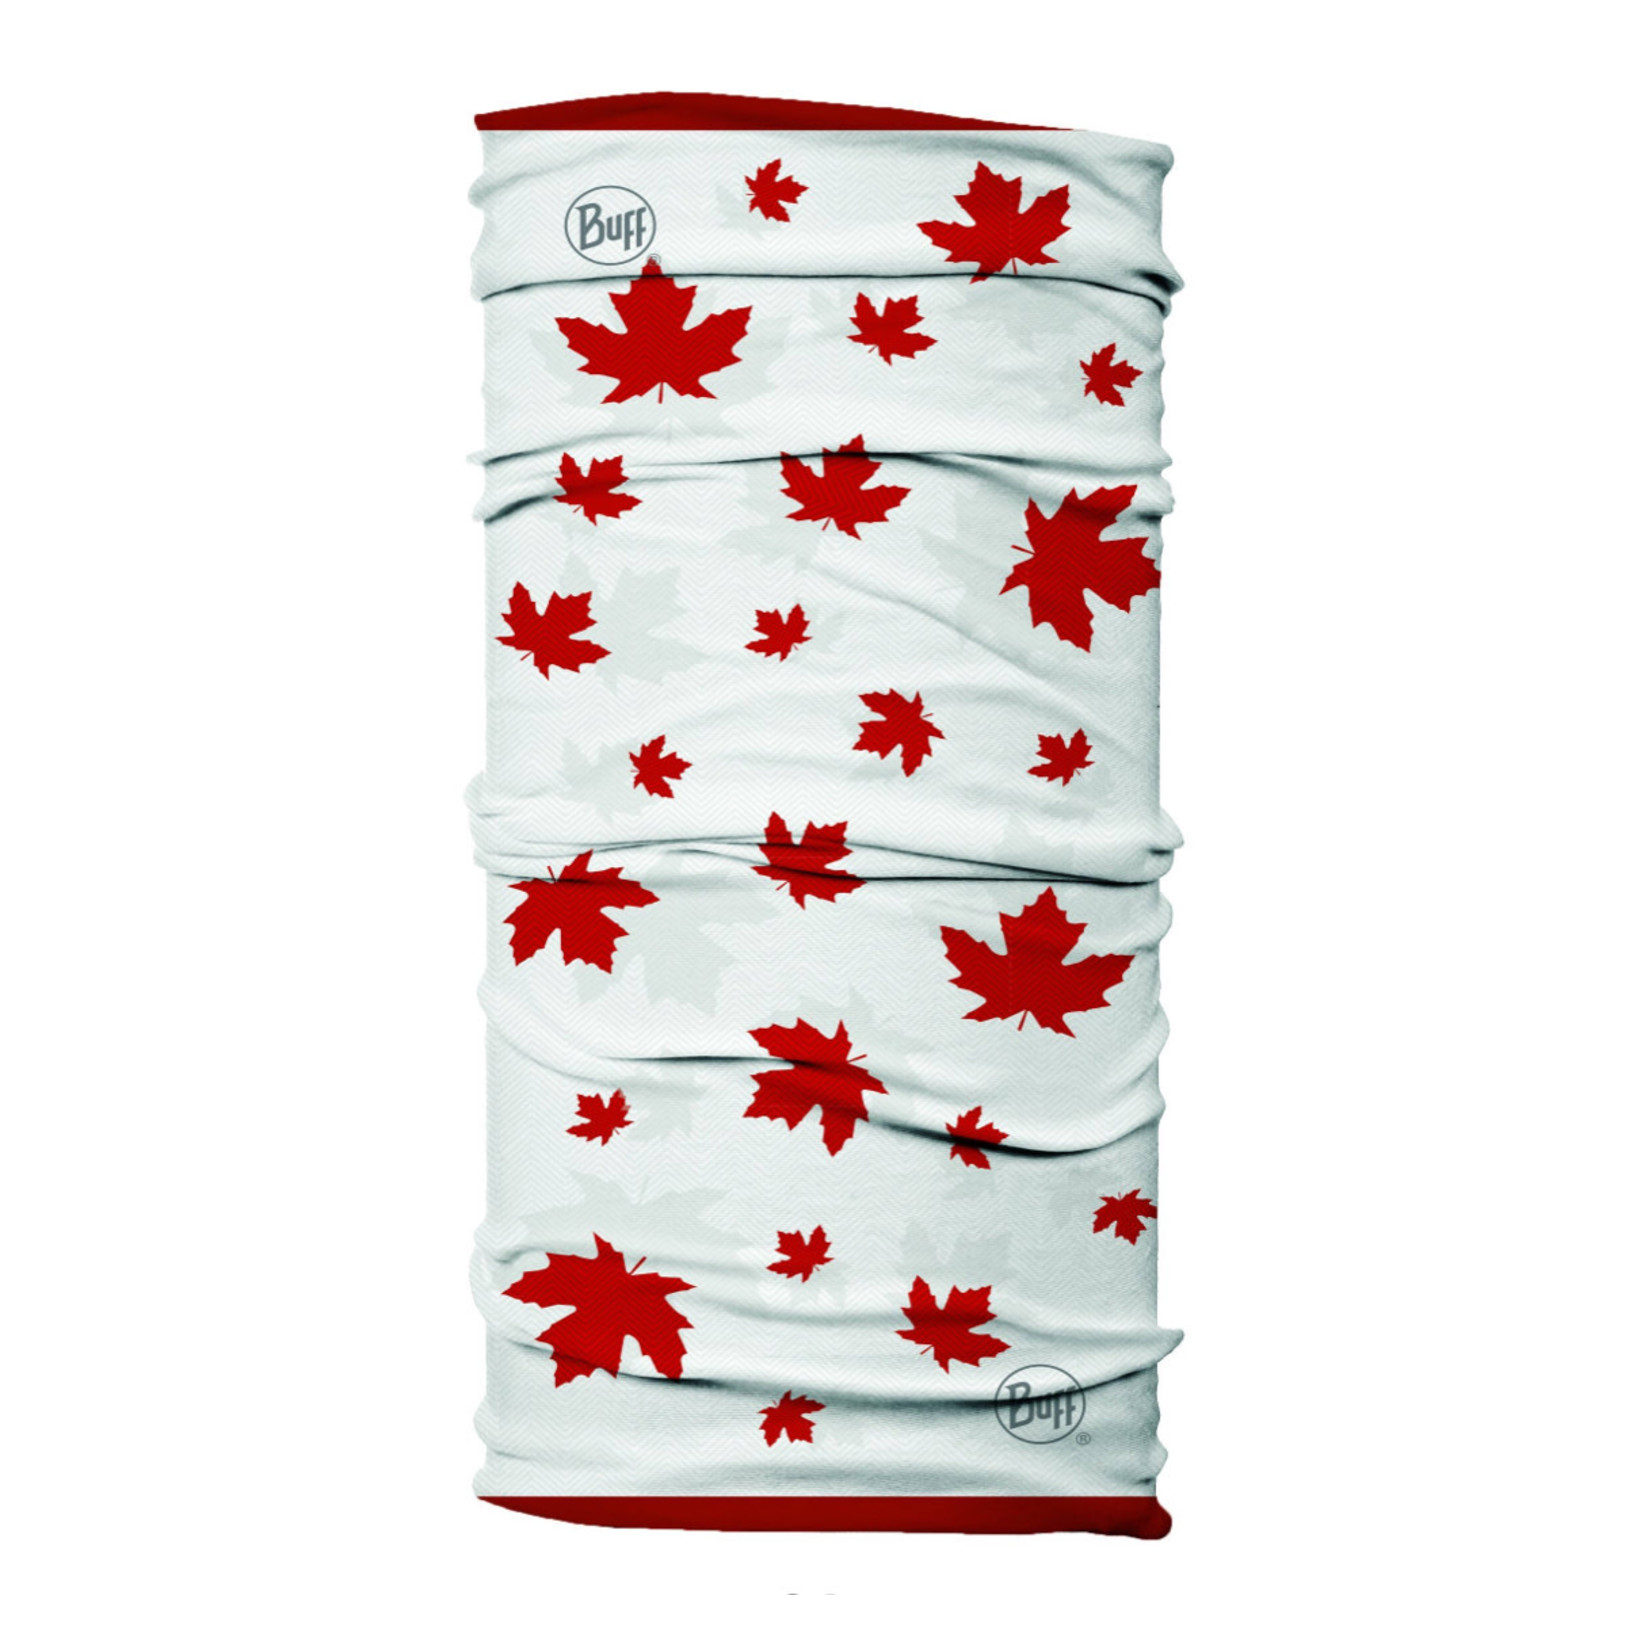 Buff Buff Original Multifunctional Headwear Canada Collection Tapestry 121734.555